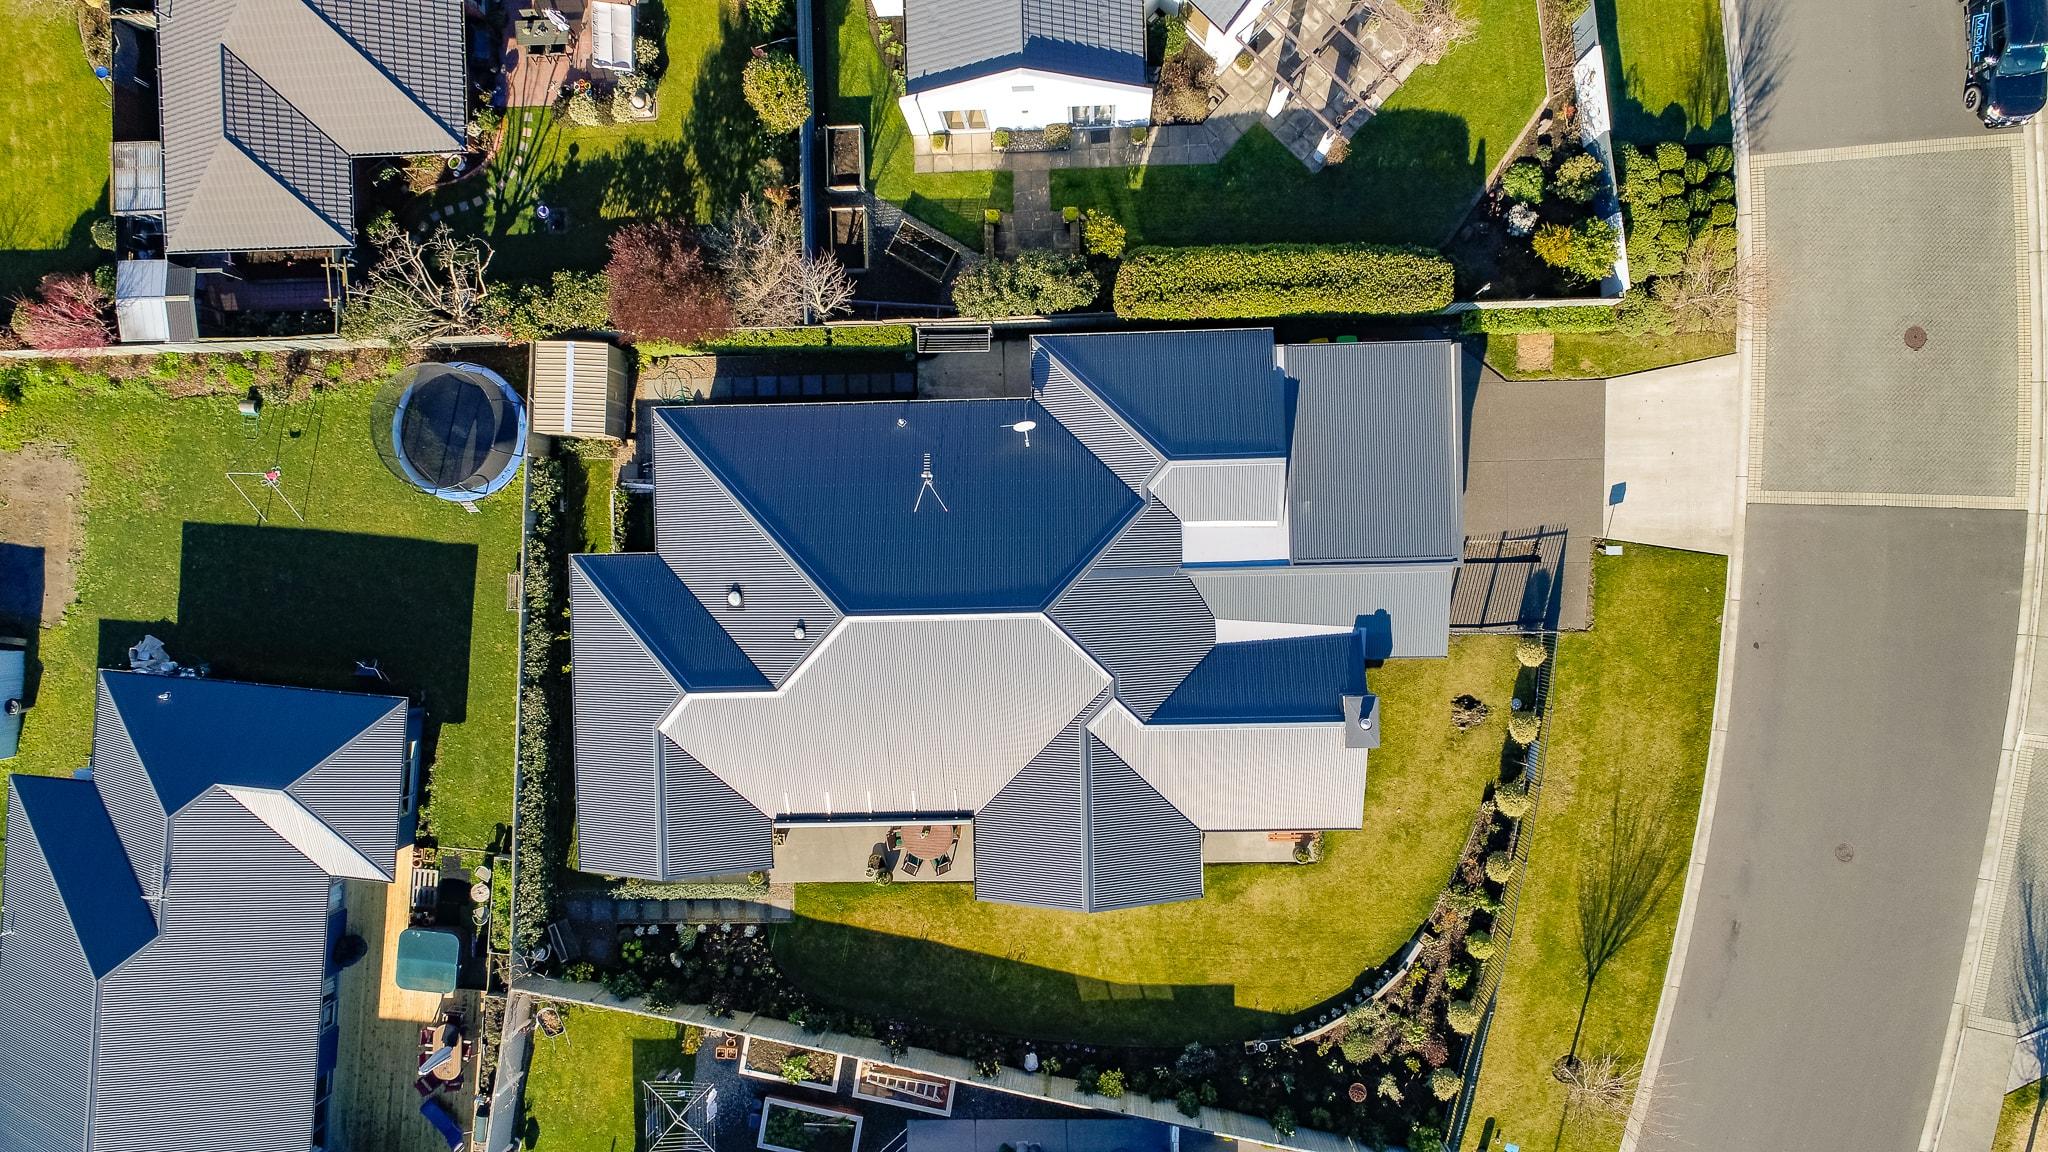 robertson_building_canterbury_ltd_ballarat_small_4-min.jpg